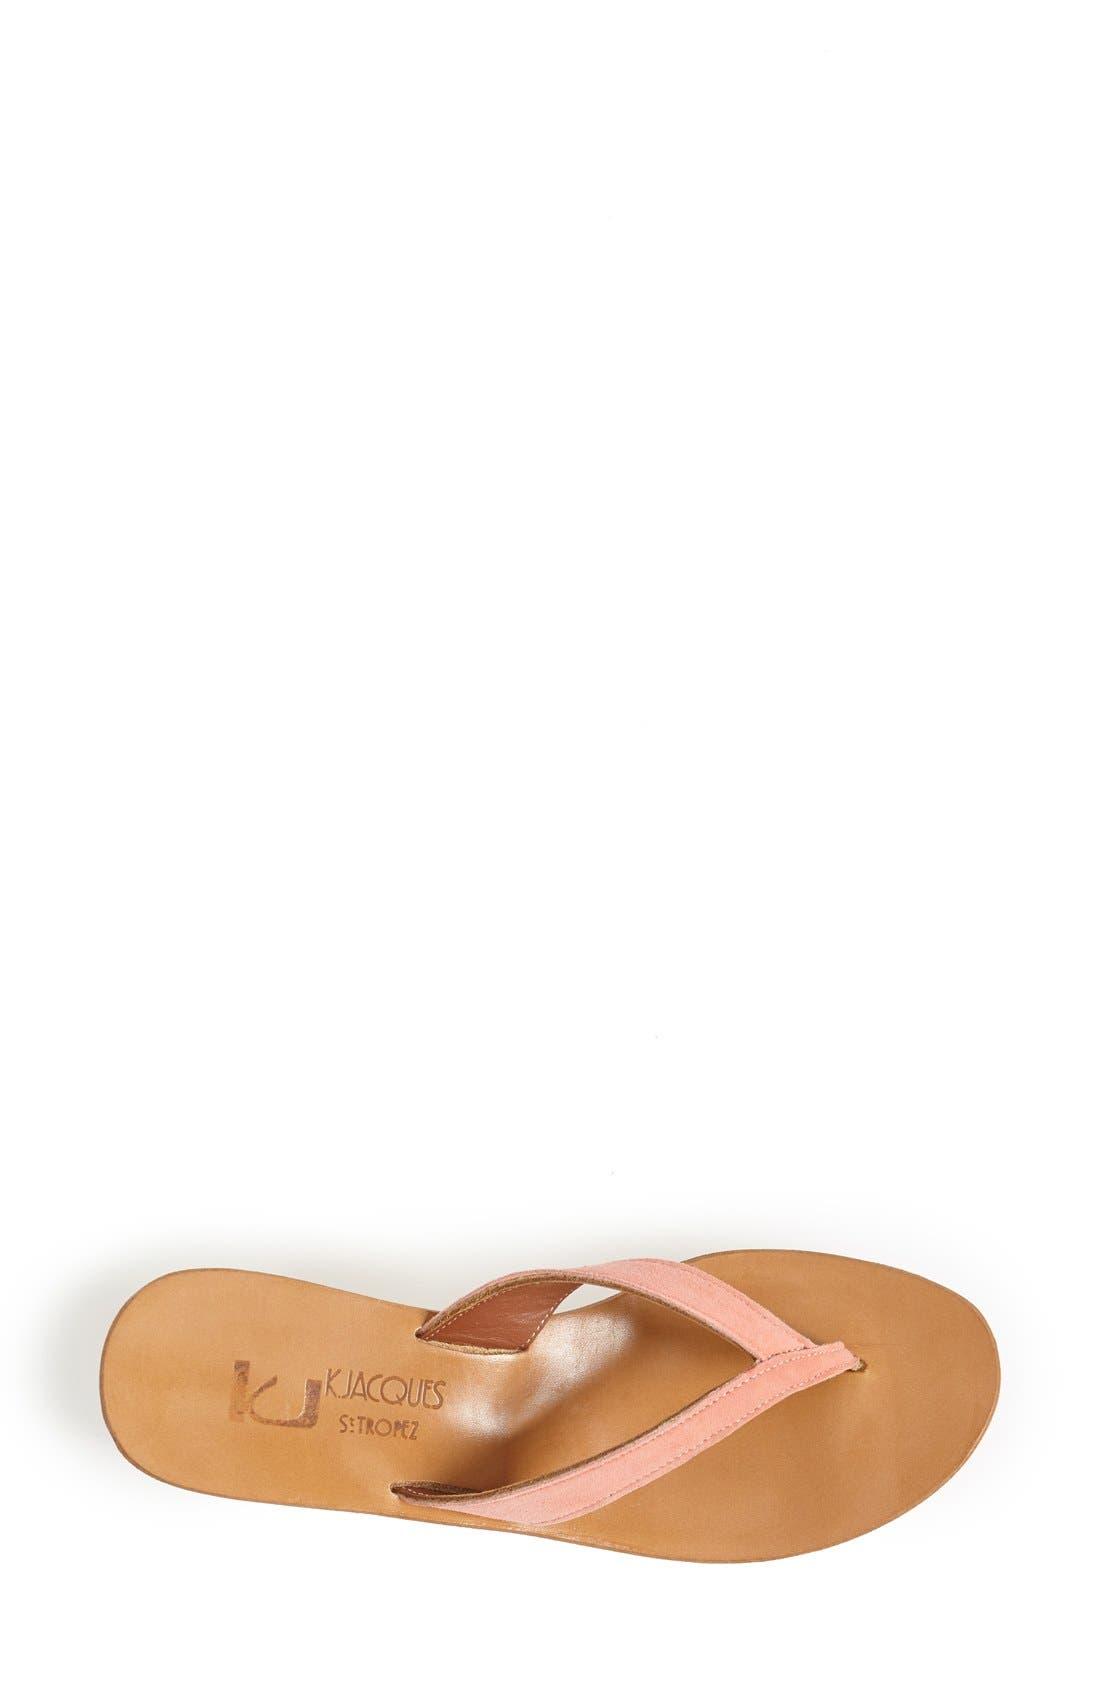 Alternate Image 3  - K.Jacques St. Tropez 'Diorite' Wedge Sandal (Women)